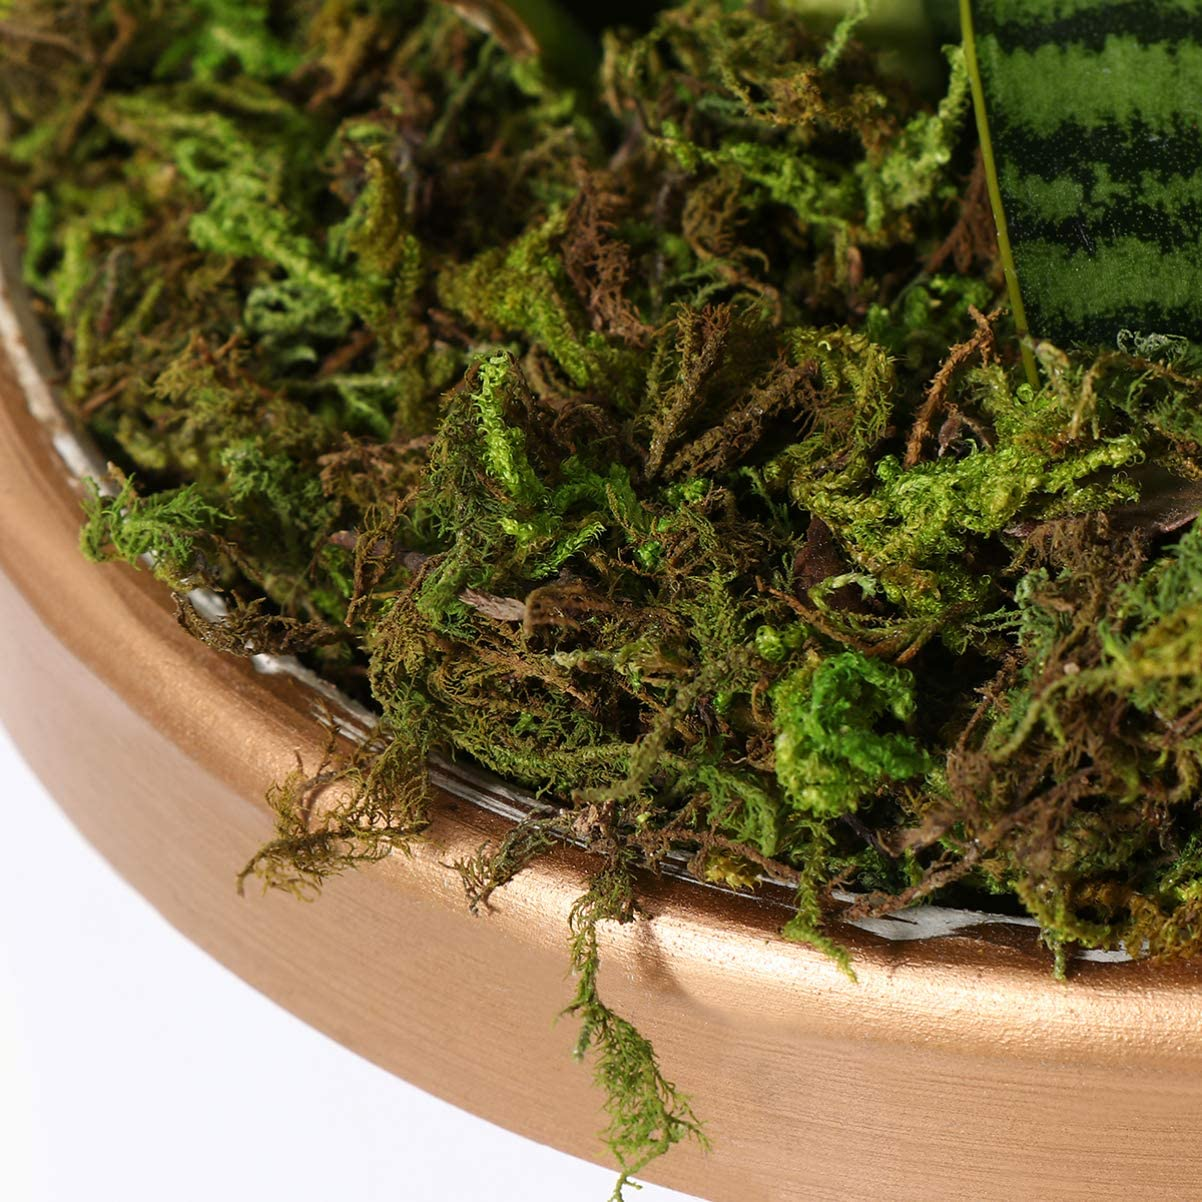 Dark Green BESPORTBLE 2 Packs Artificial Moss Simulation Fake Green Plants Flowerpot Micro Landscape Decoration for Home Garden Patio Fairy Gardens Terrariums Accessories